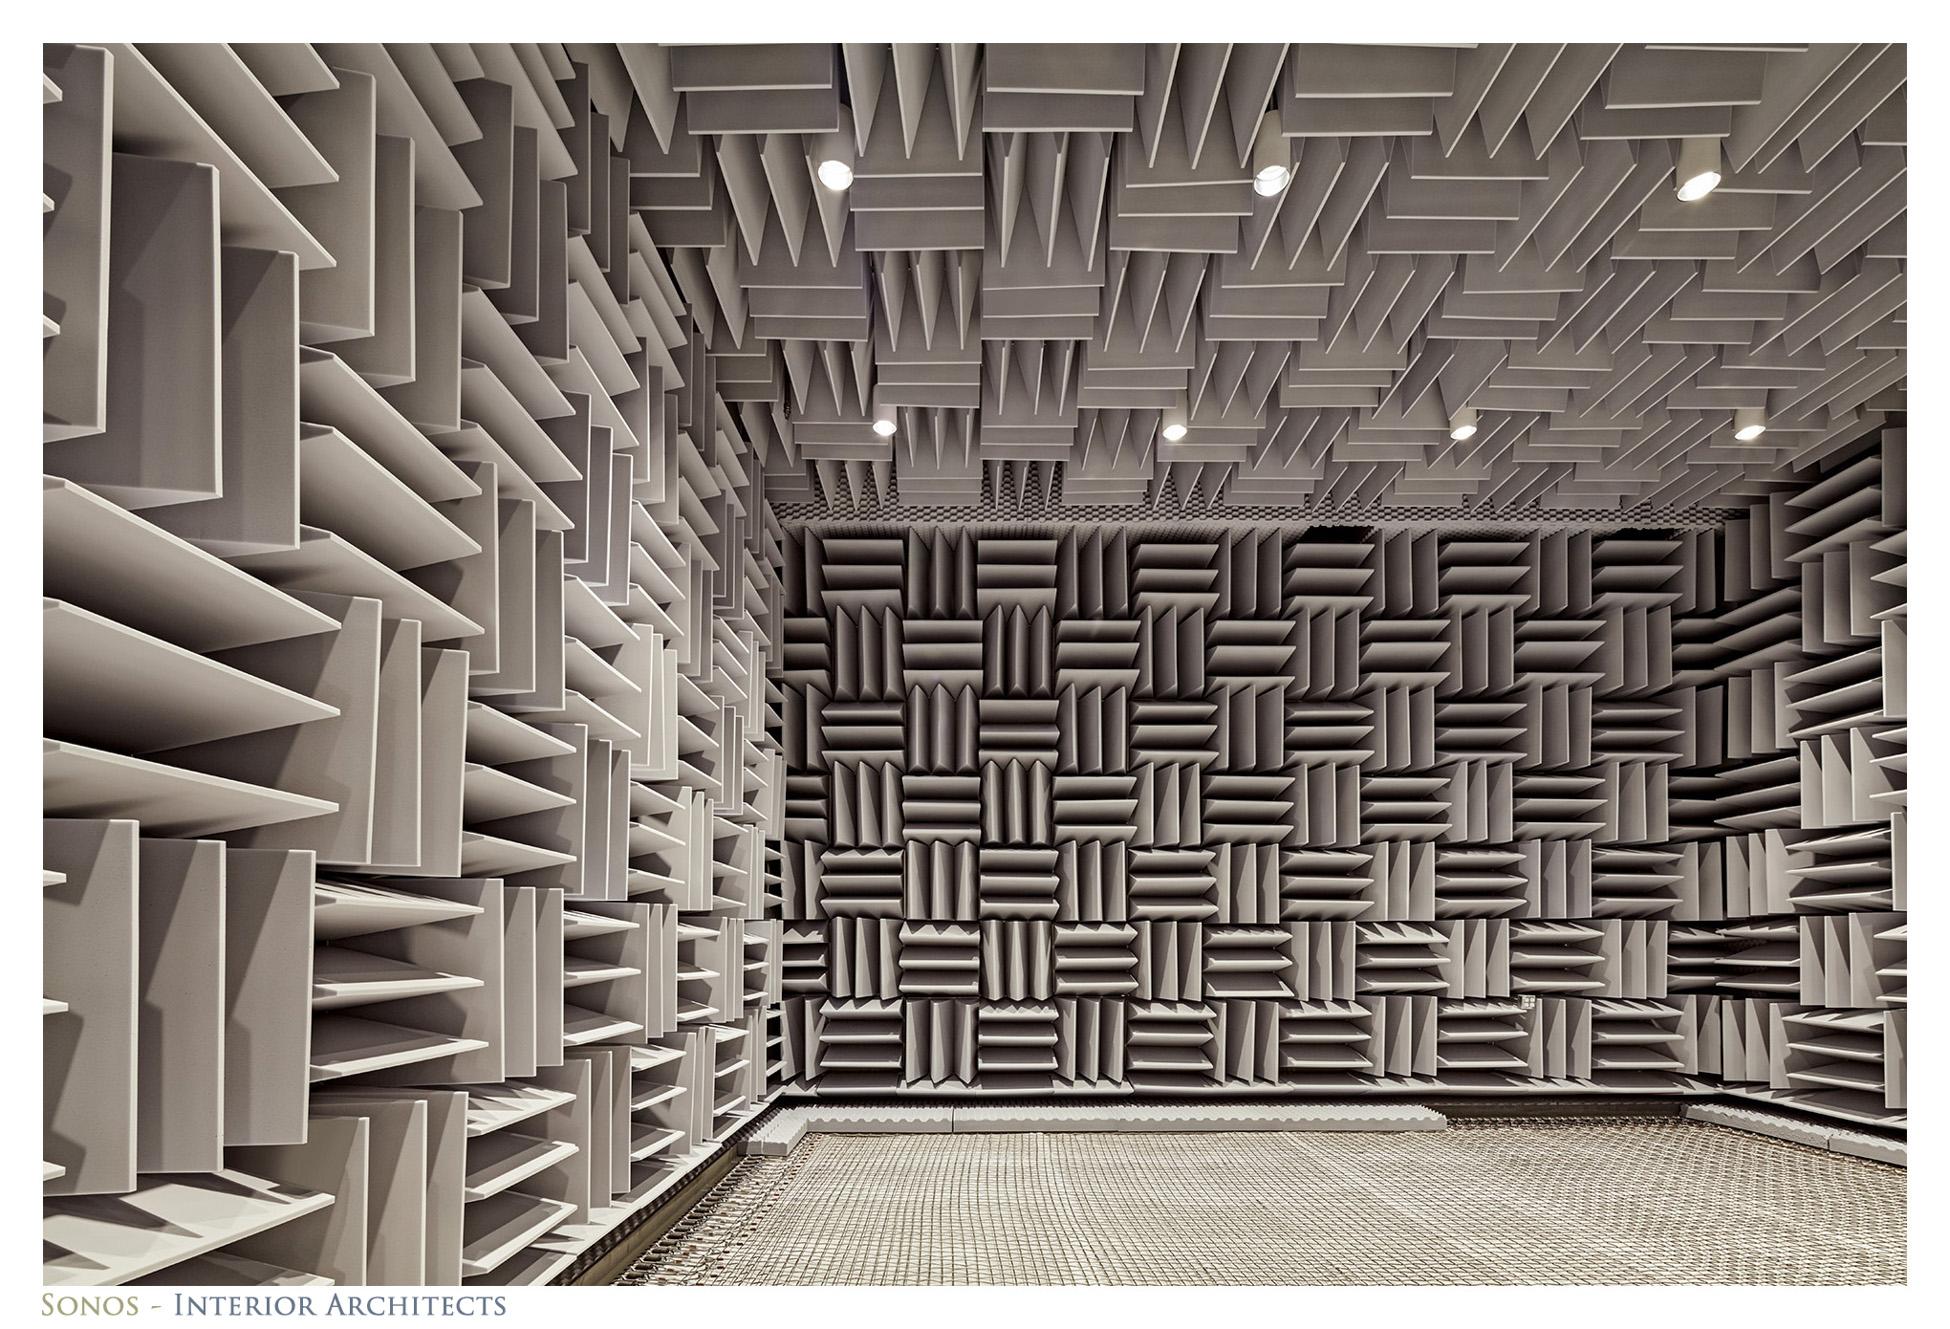 043_Robert-Benson-Photography-IA_Interior-Architects-Sonos_14.jpg